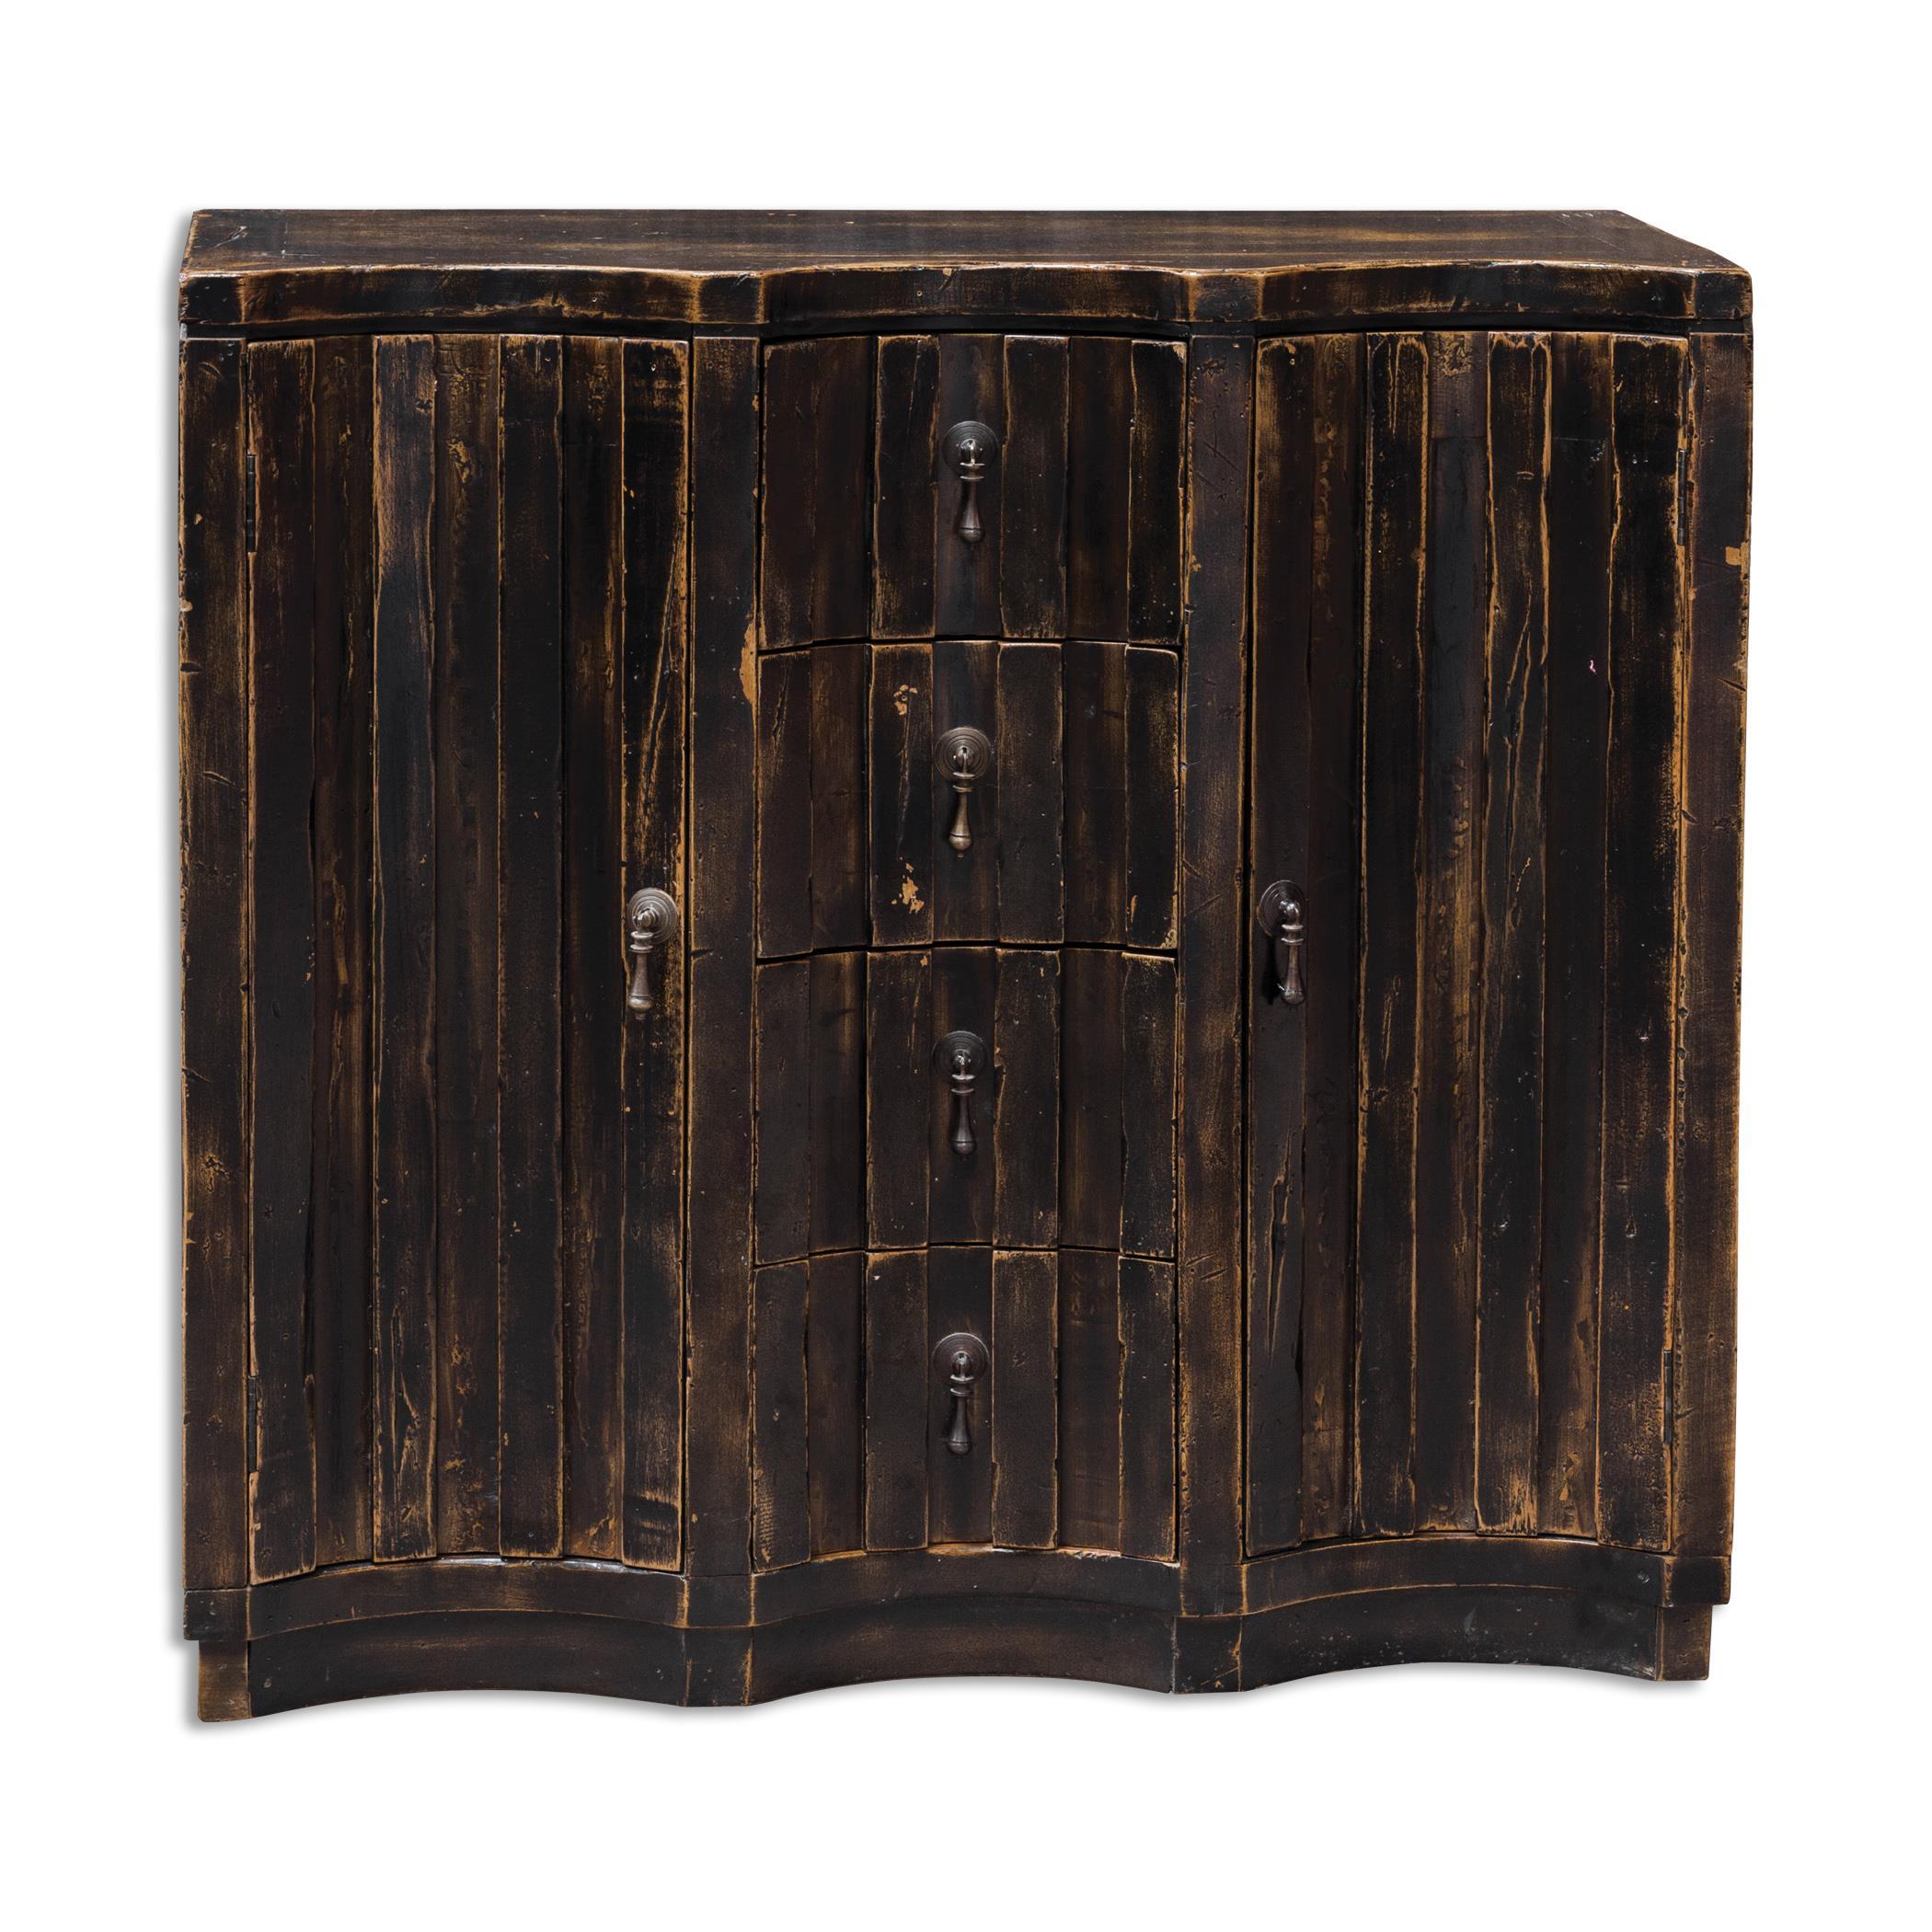 Uttermost Accent Furniture Edeline Black Buffet Chest - Item Number: 25665